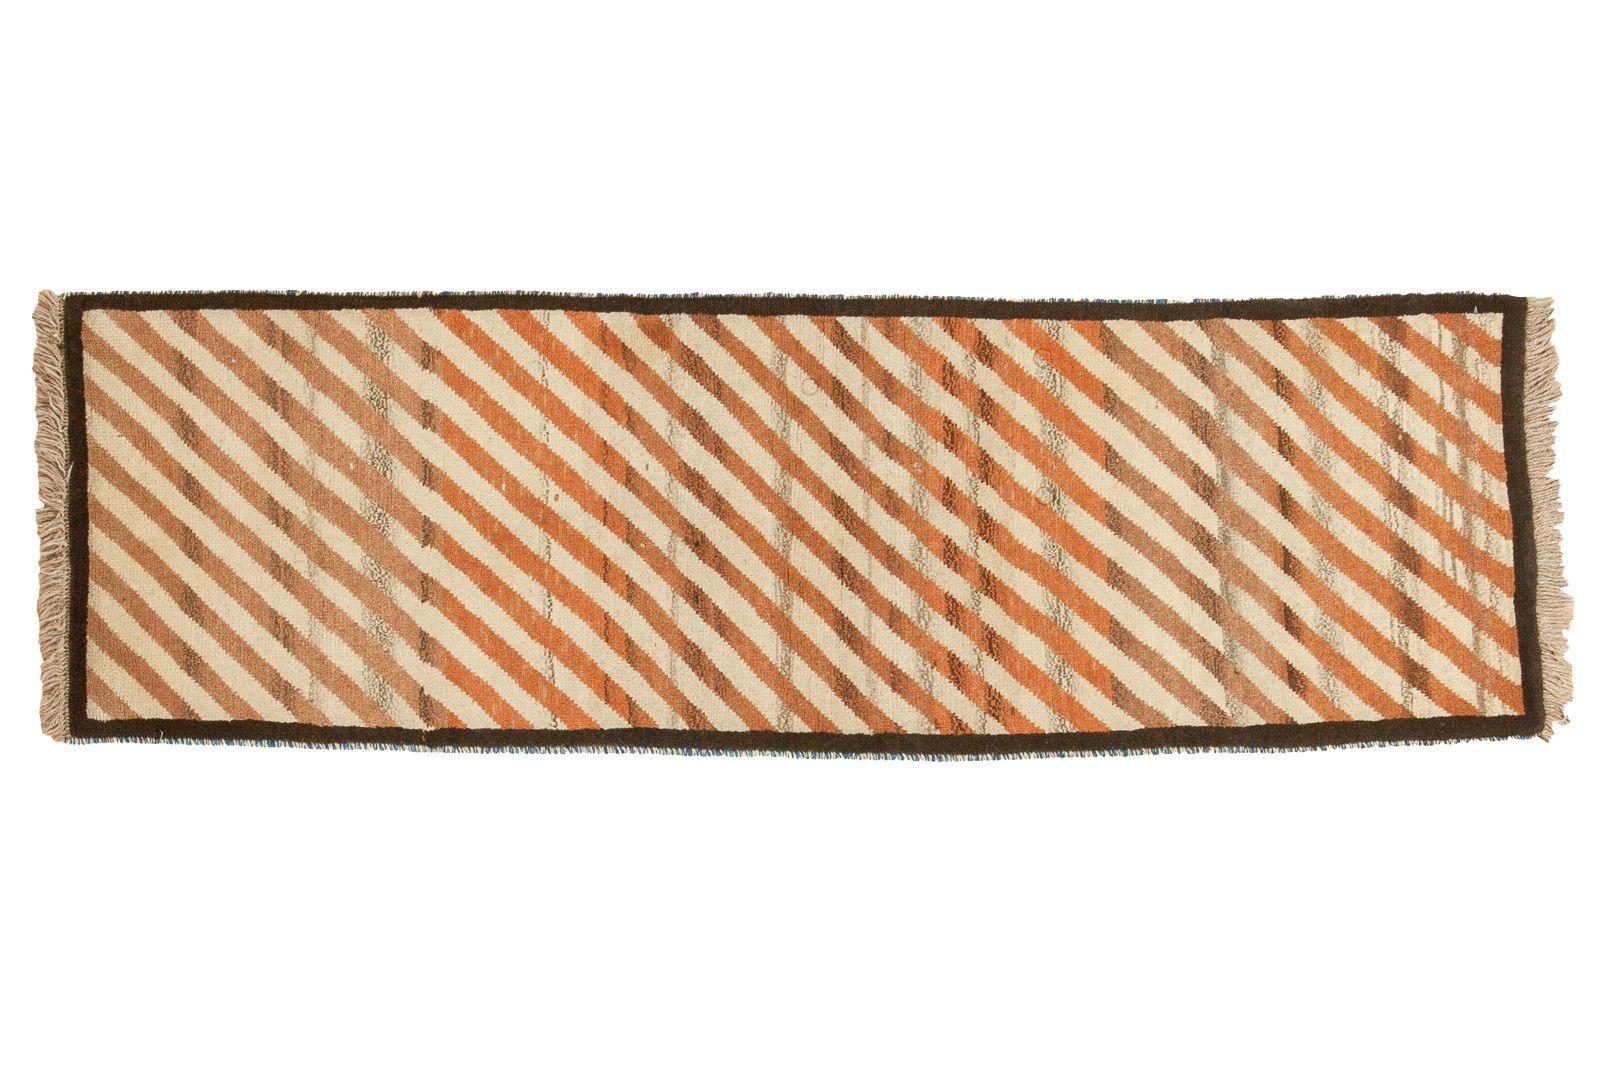 2x6.5 Vintage Gabbeh Rug Runner